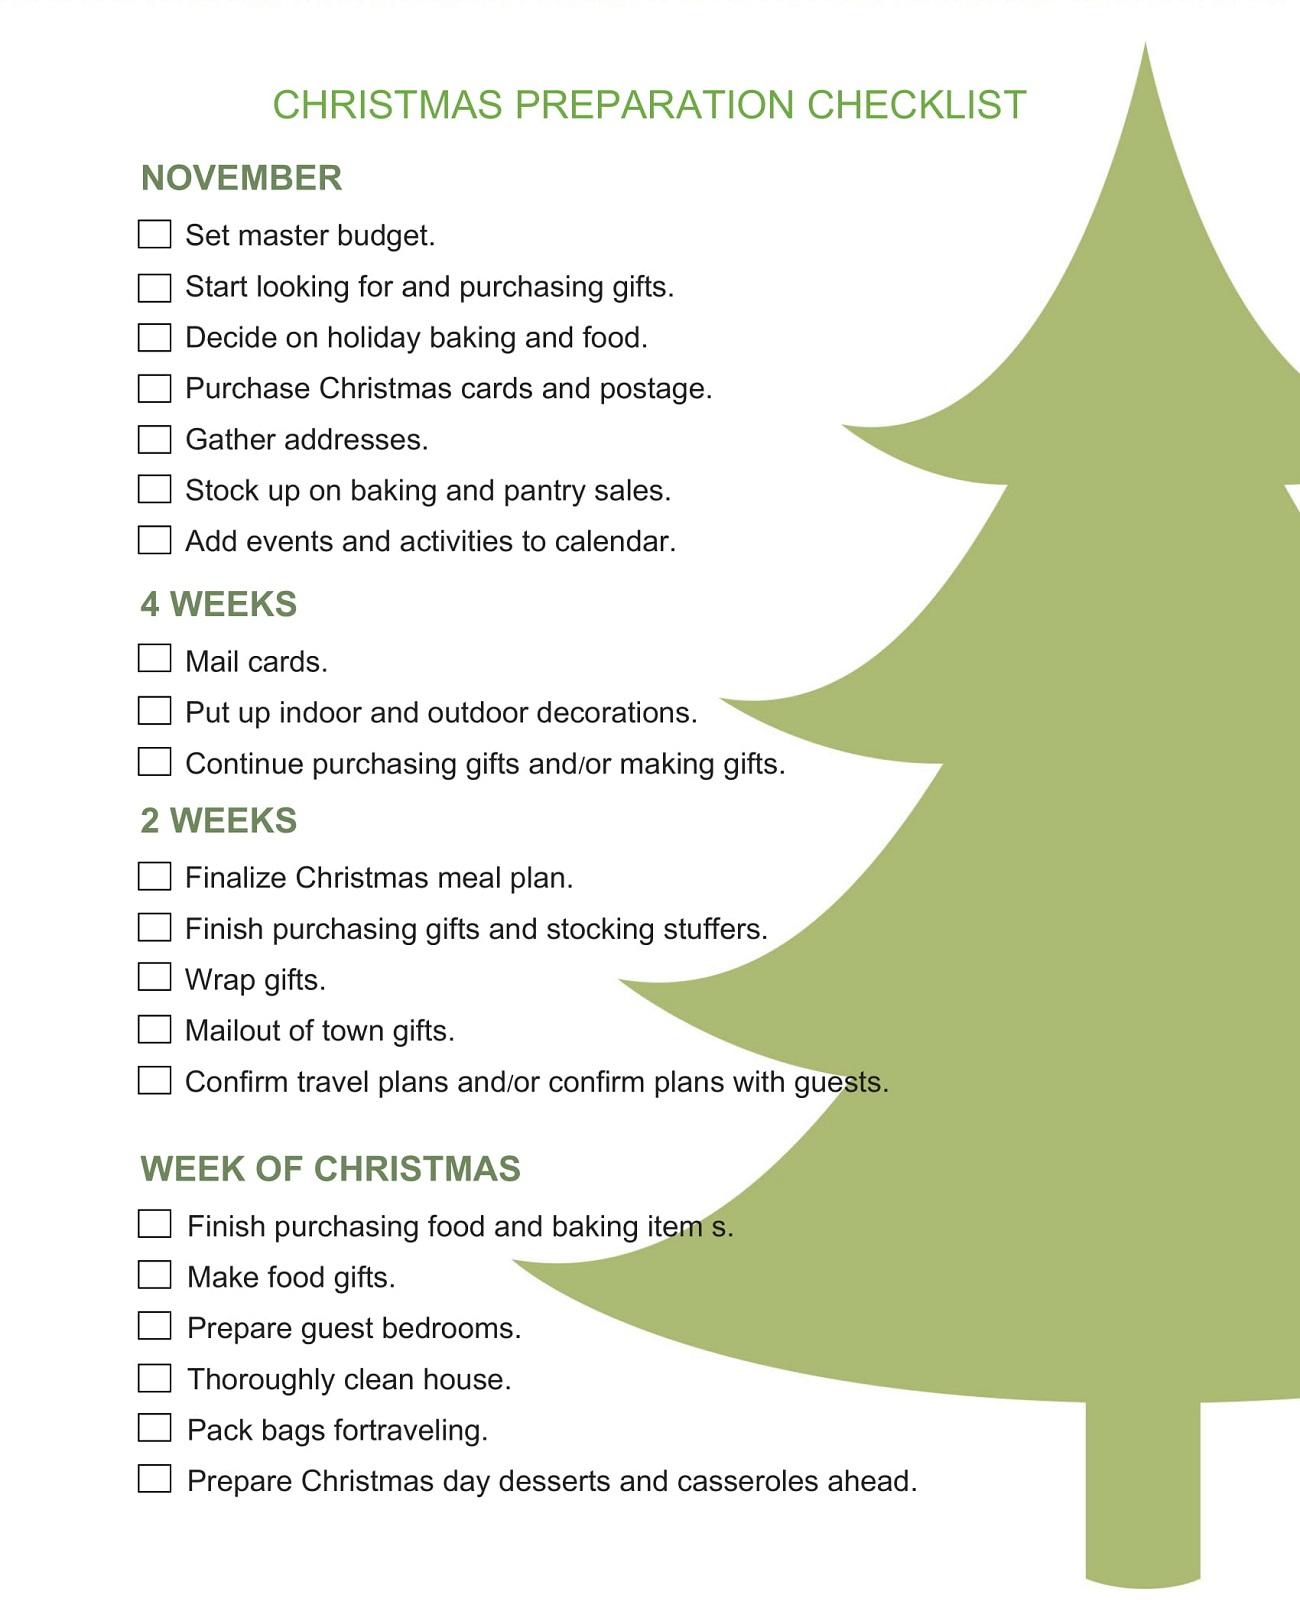 Sample Christmas Preparation Checklist Template Word Doc